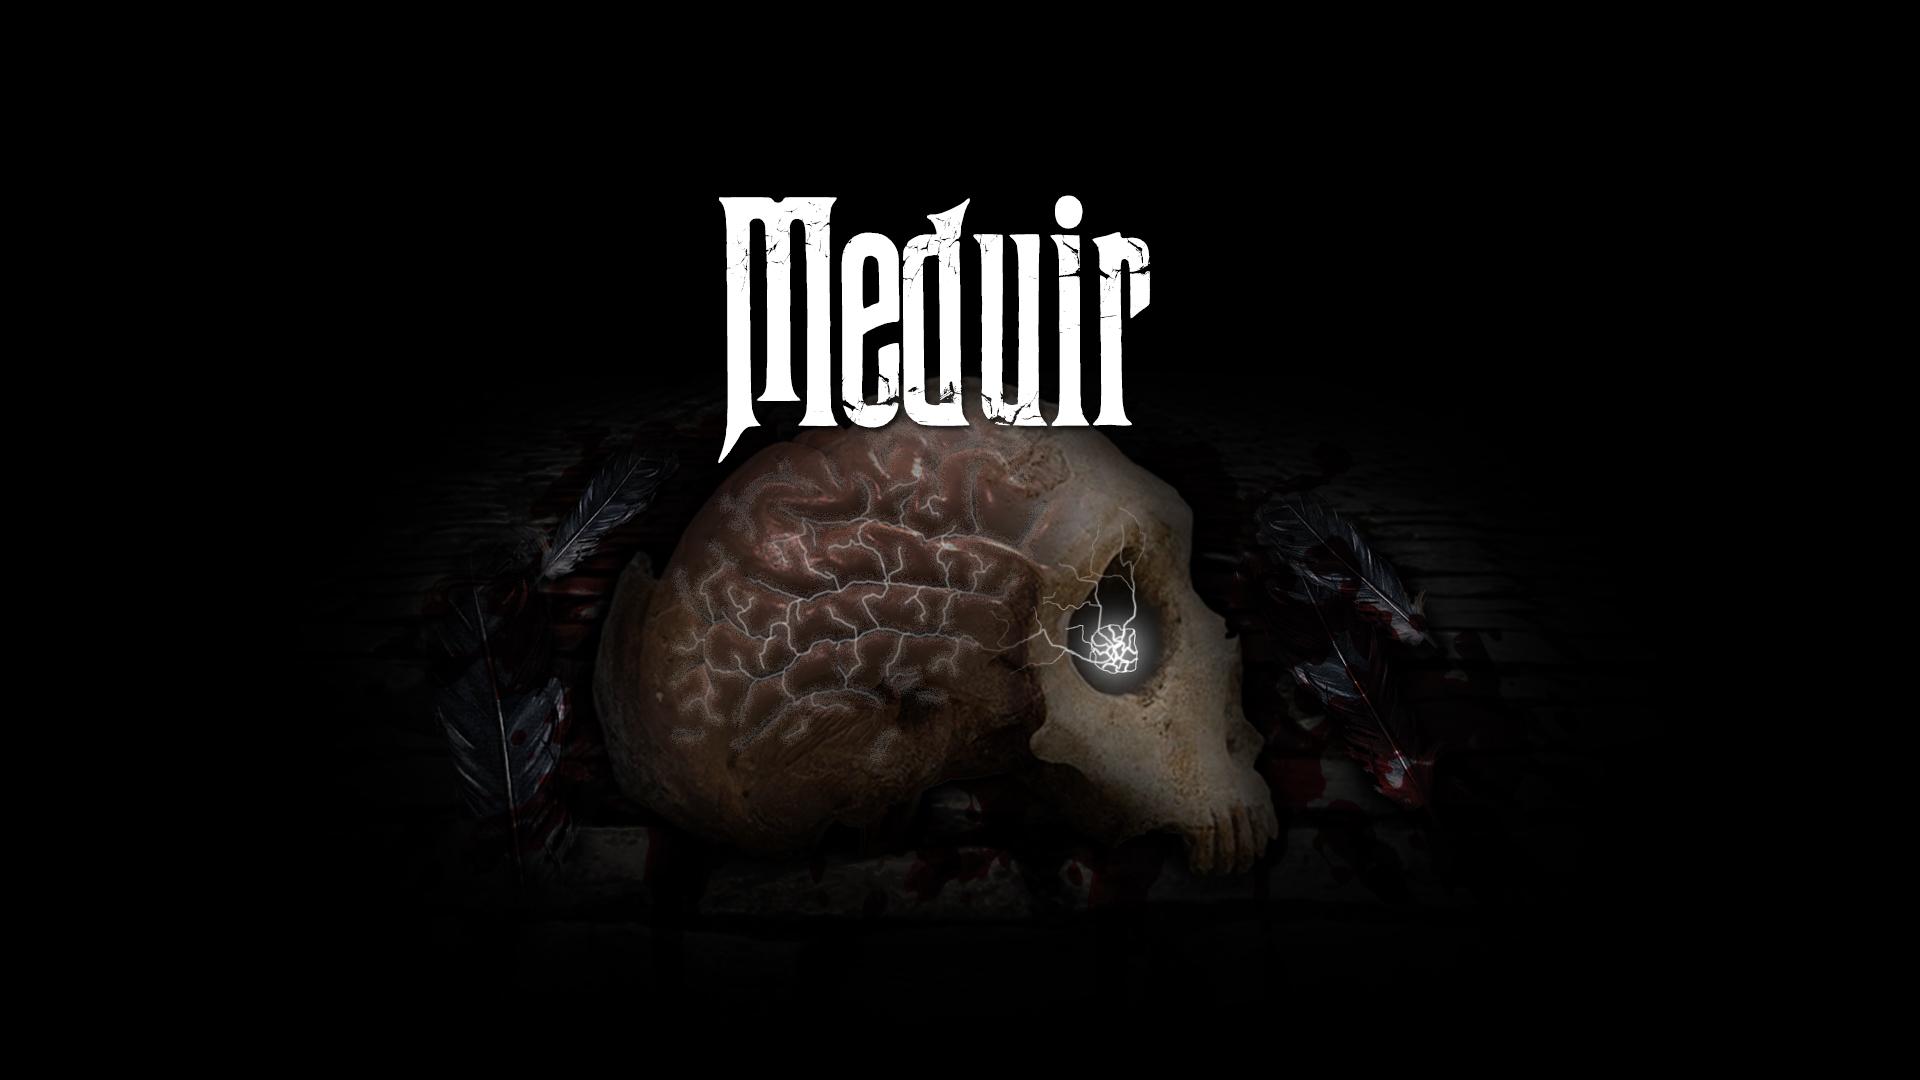 Meduir